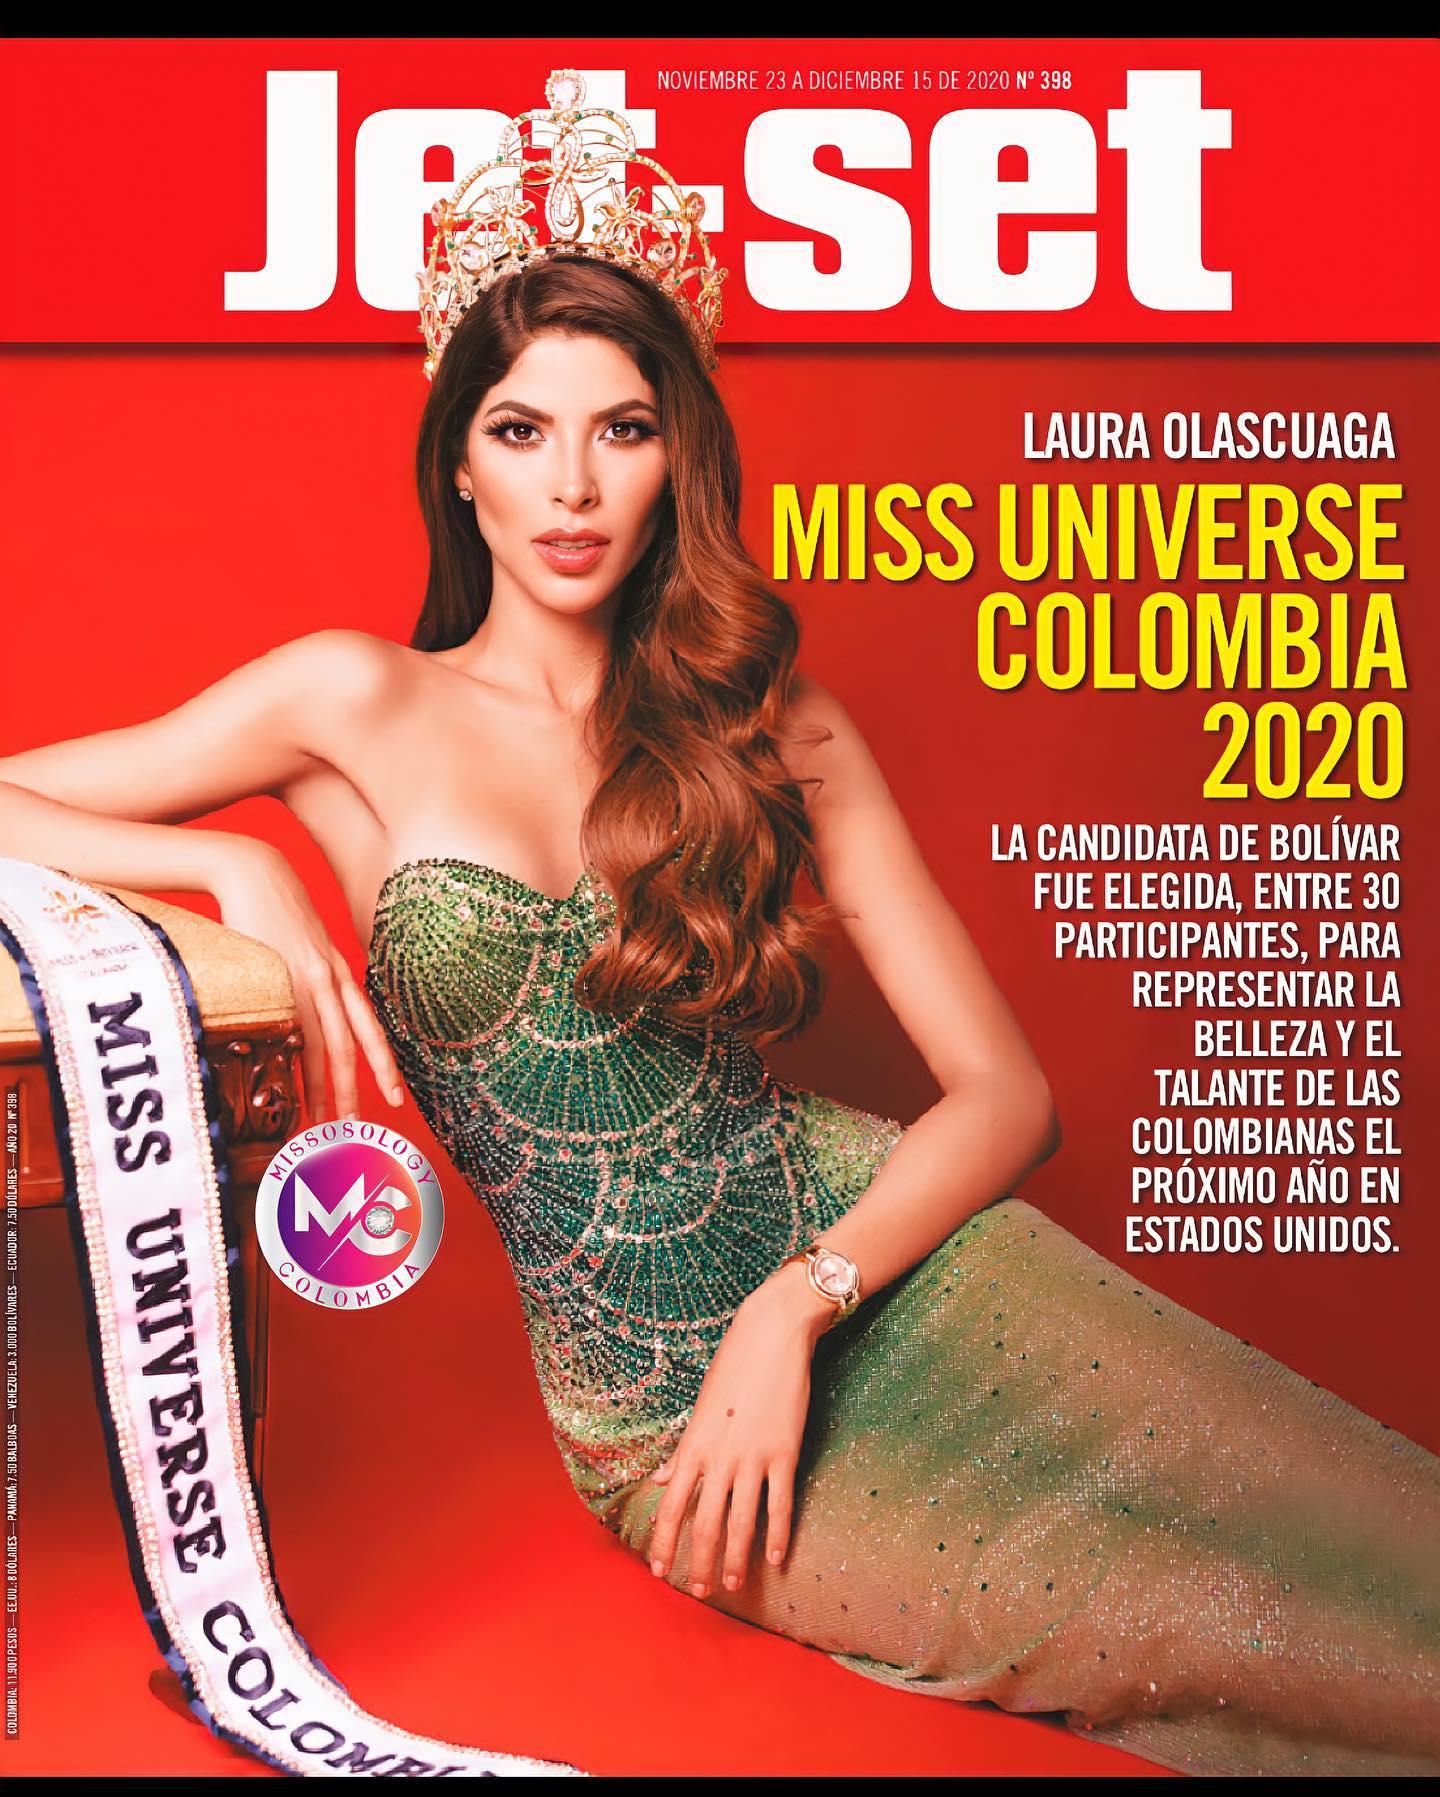 laura olascuaga, miss colombia universo 2020. - Página 5 12605110